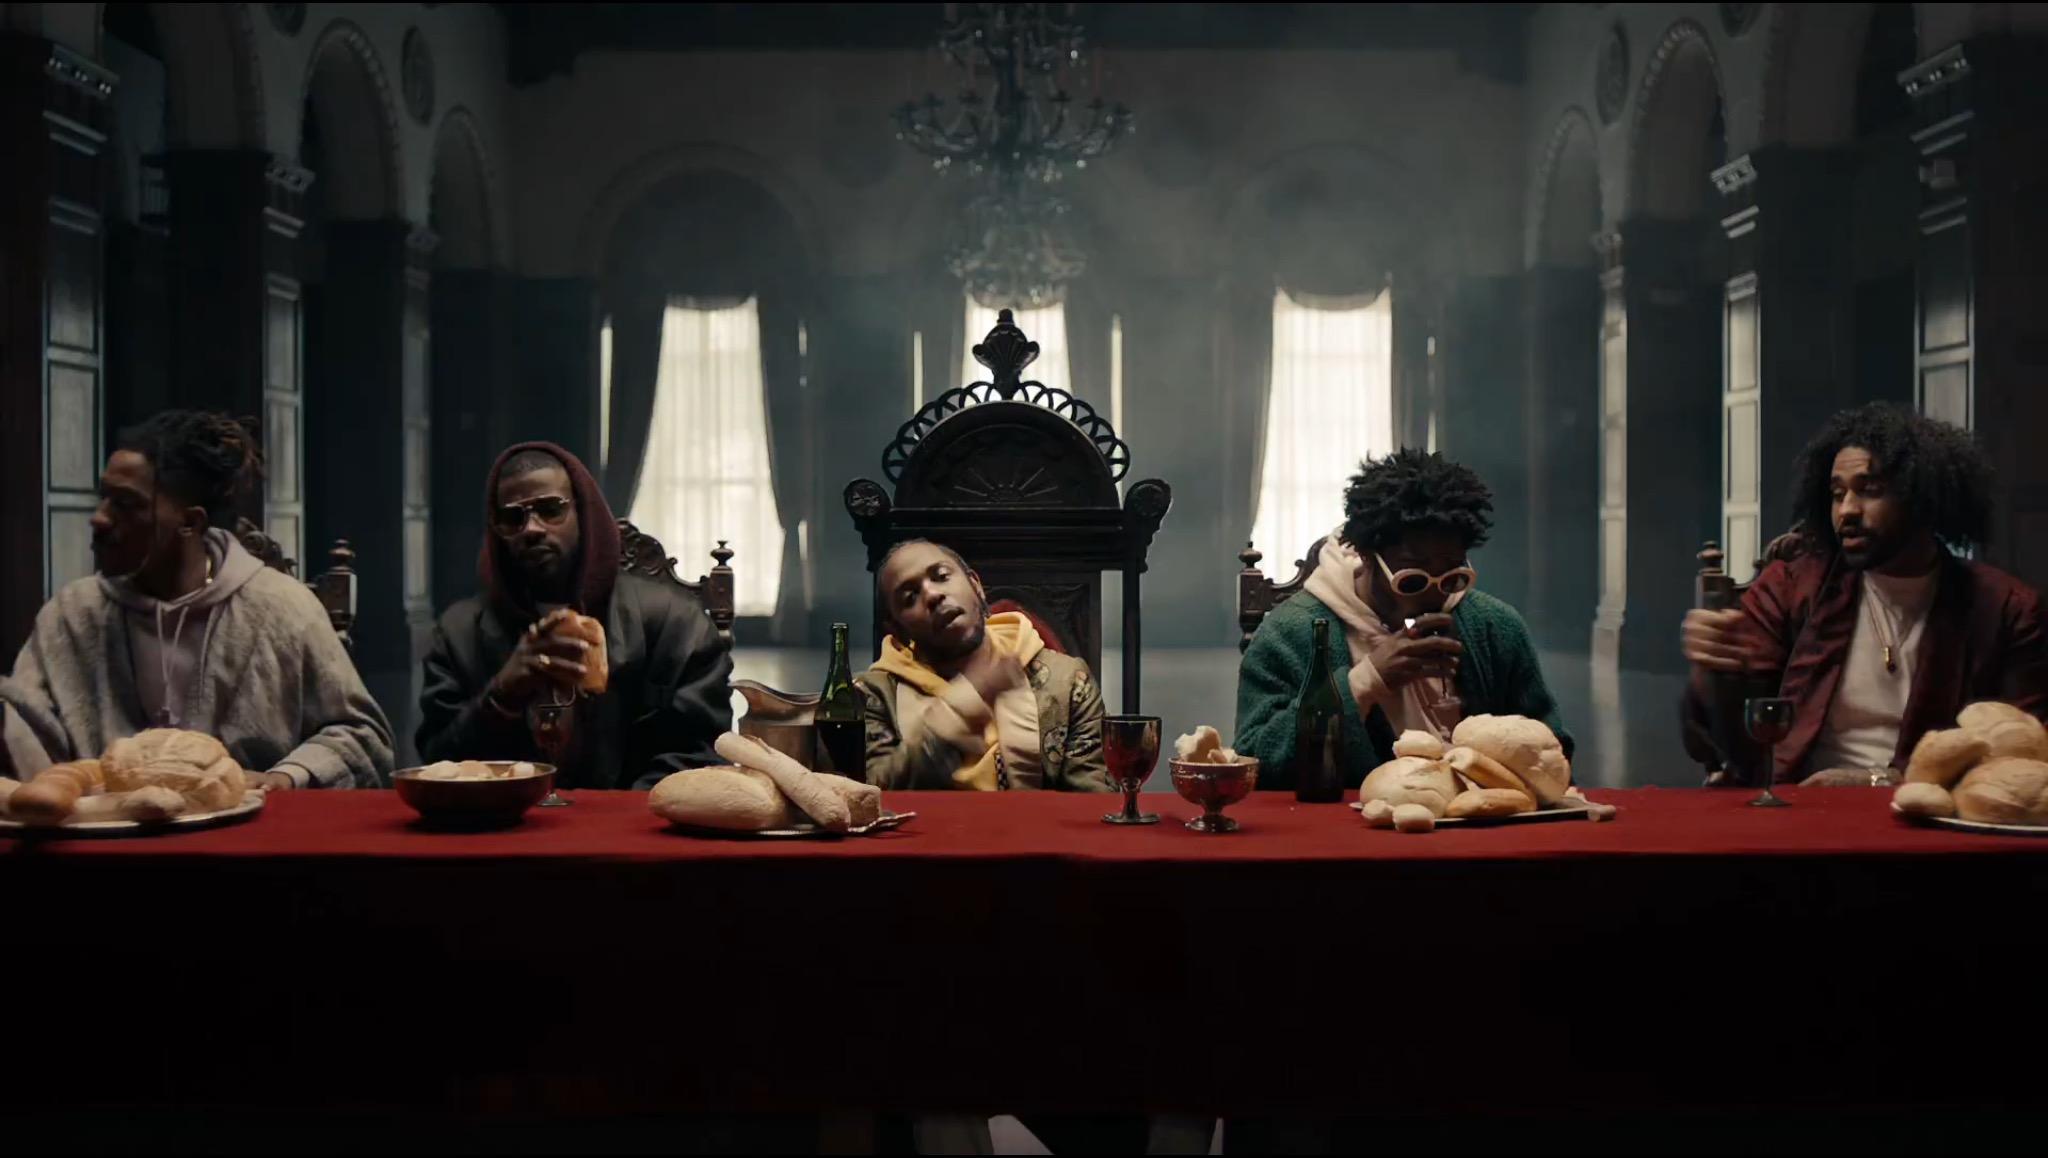 Kendrick Lamar Humble Video 2017 Photo Gallery Imdb